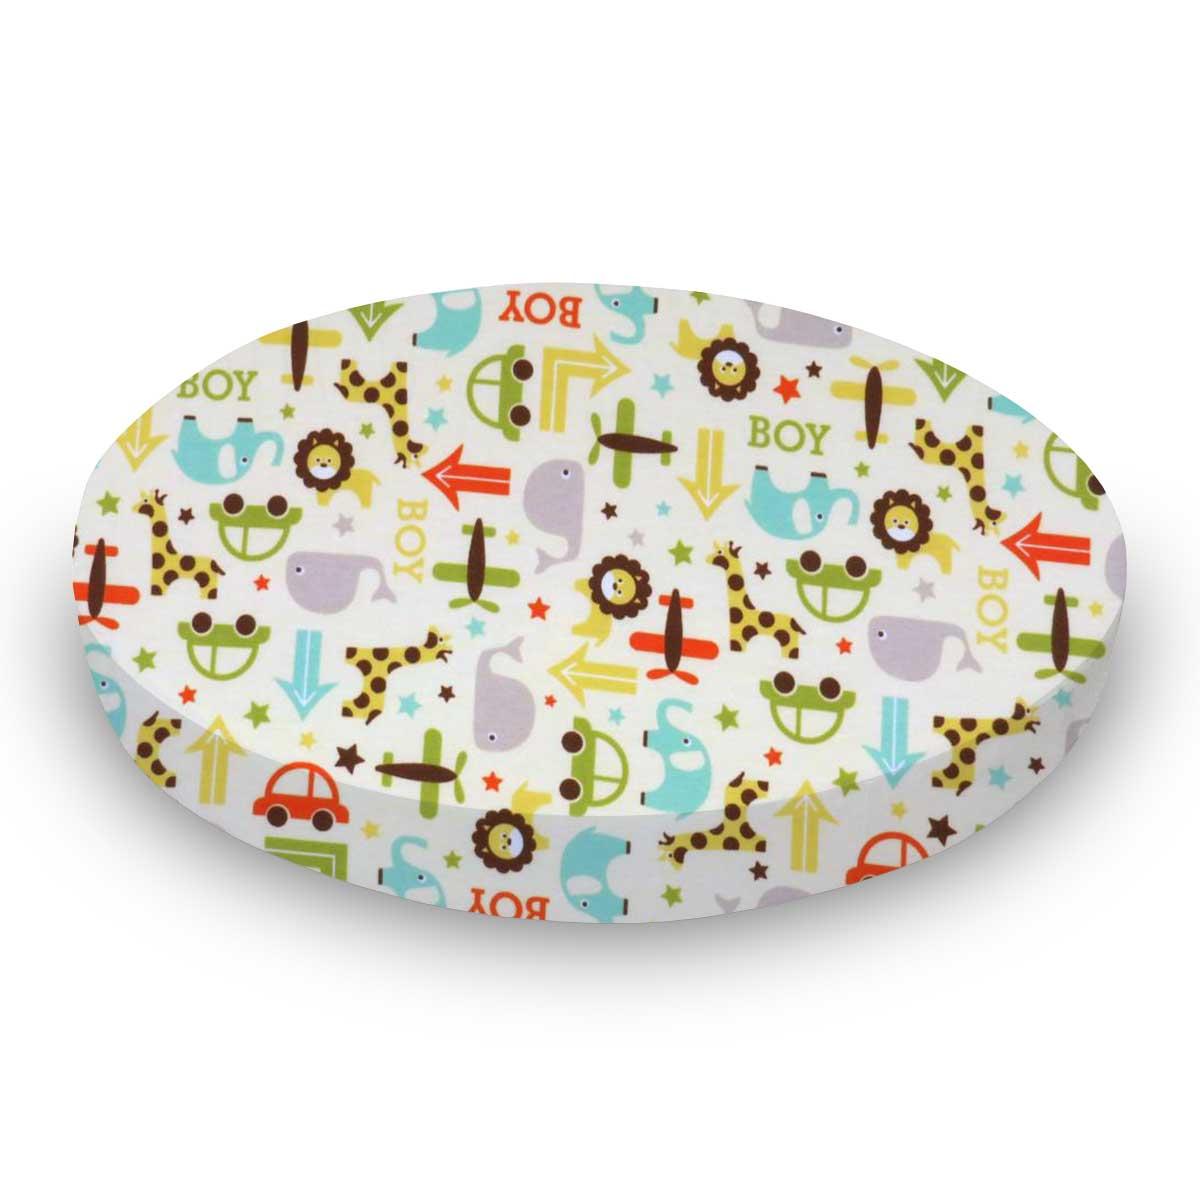 Sheetworld.com Round Crib - Cars & Animals Cream - 45`` Fitted